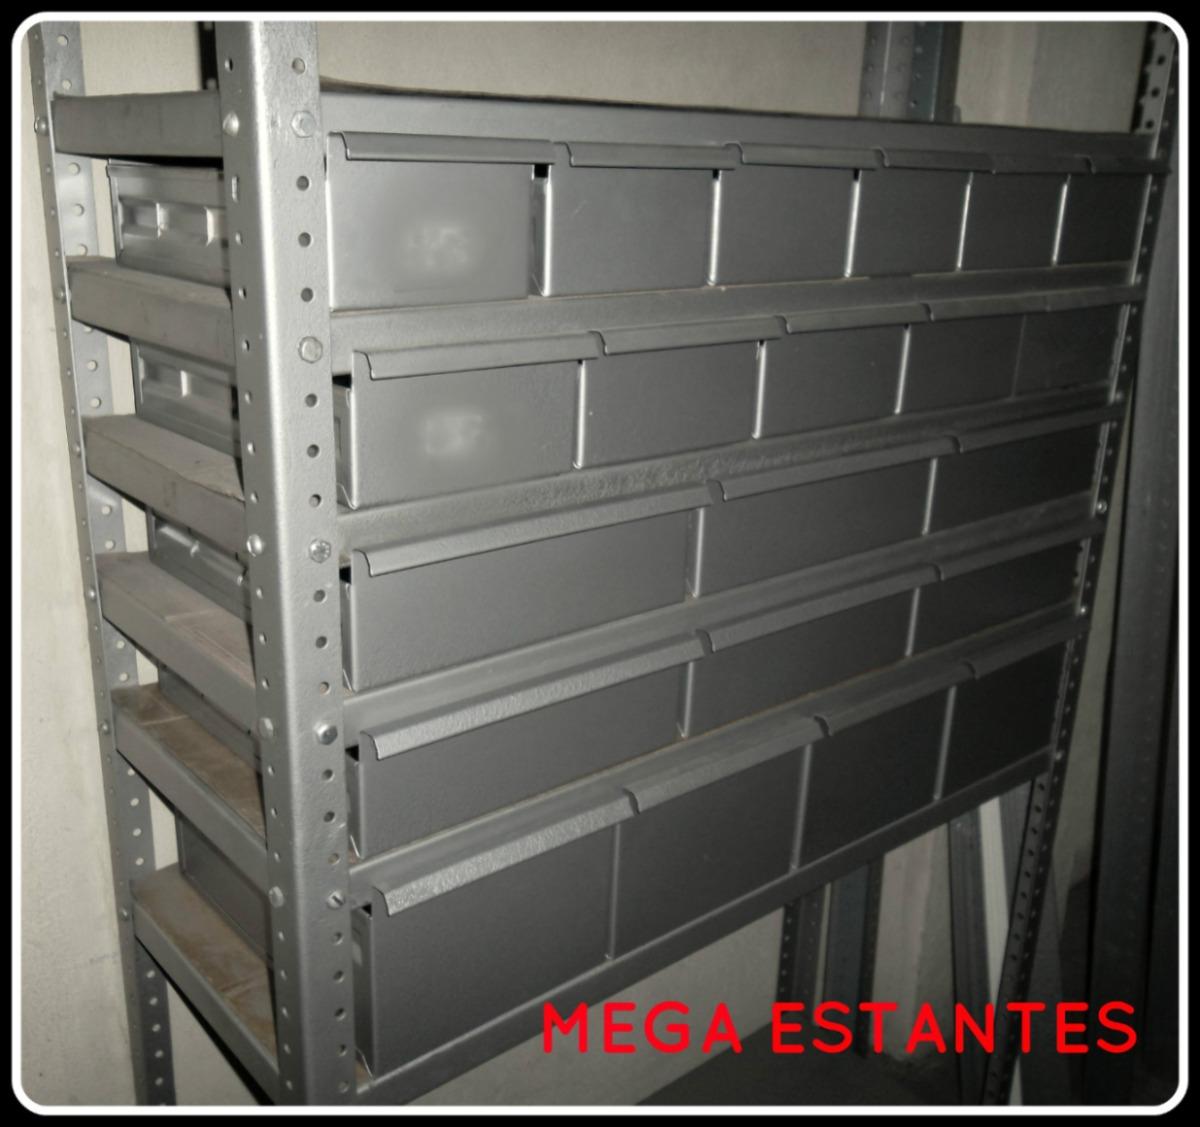 Estanteria metalica precio cool manomano with estanteria - Estanteria metalica precio ...